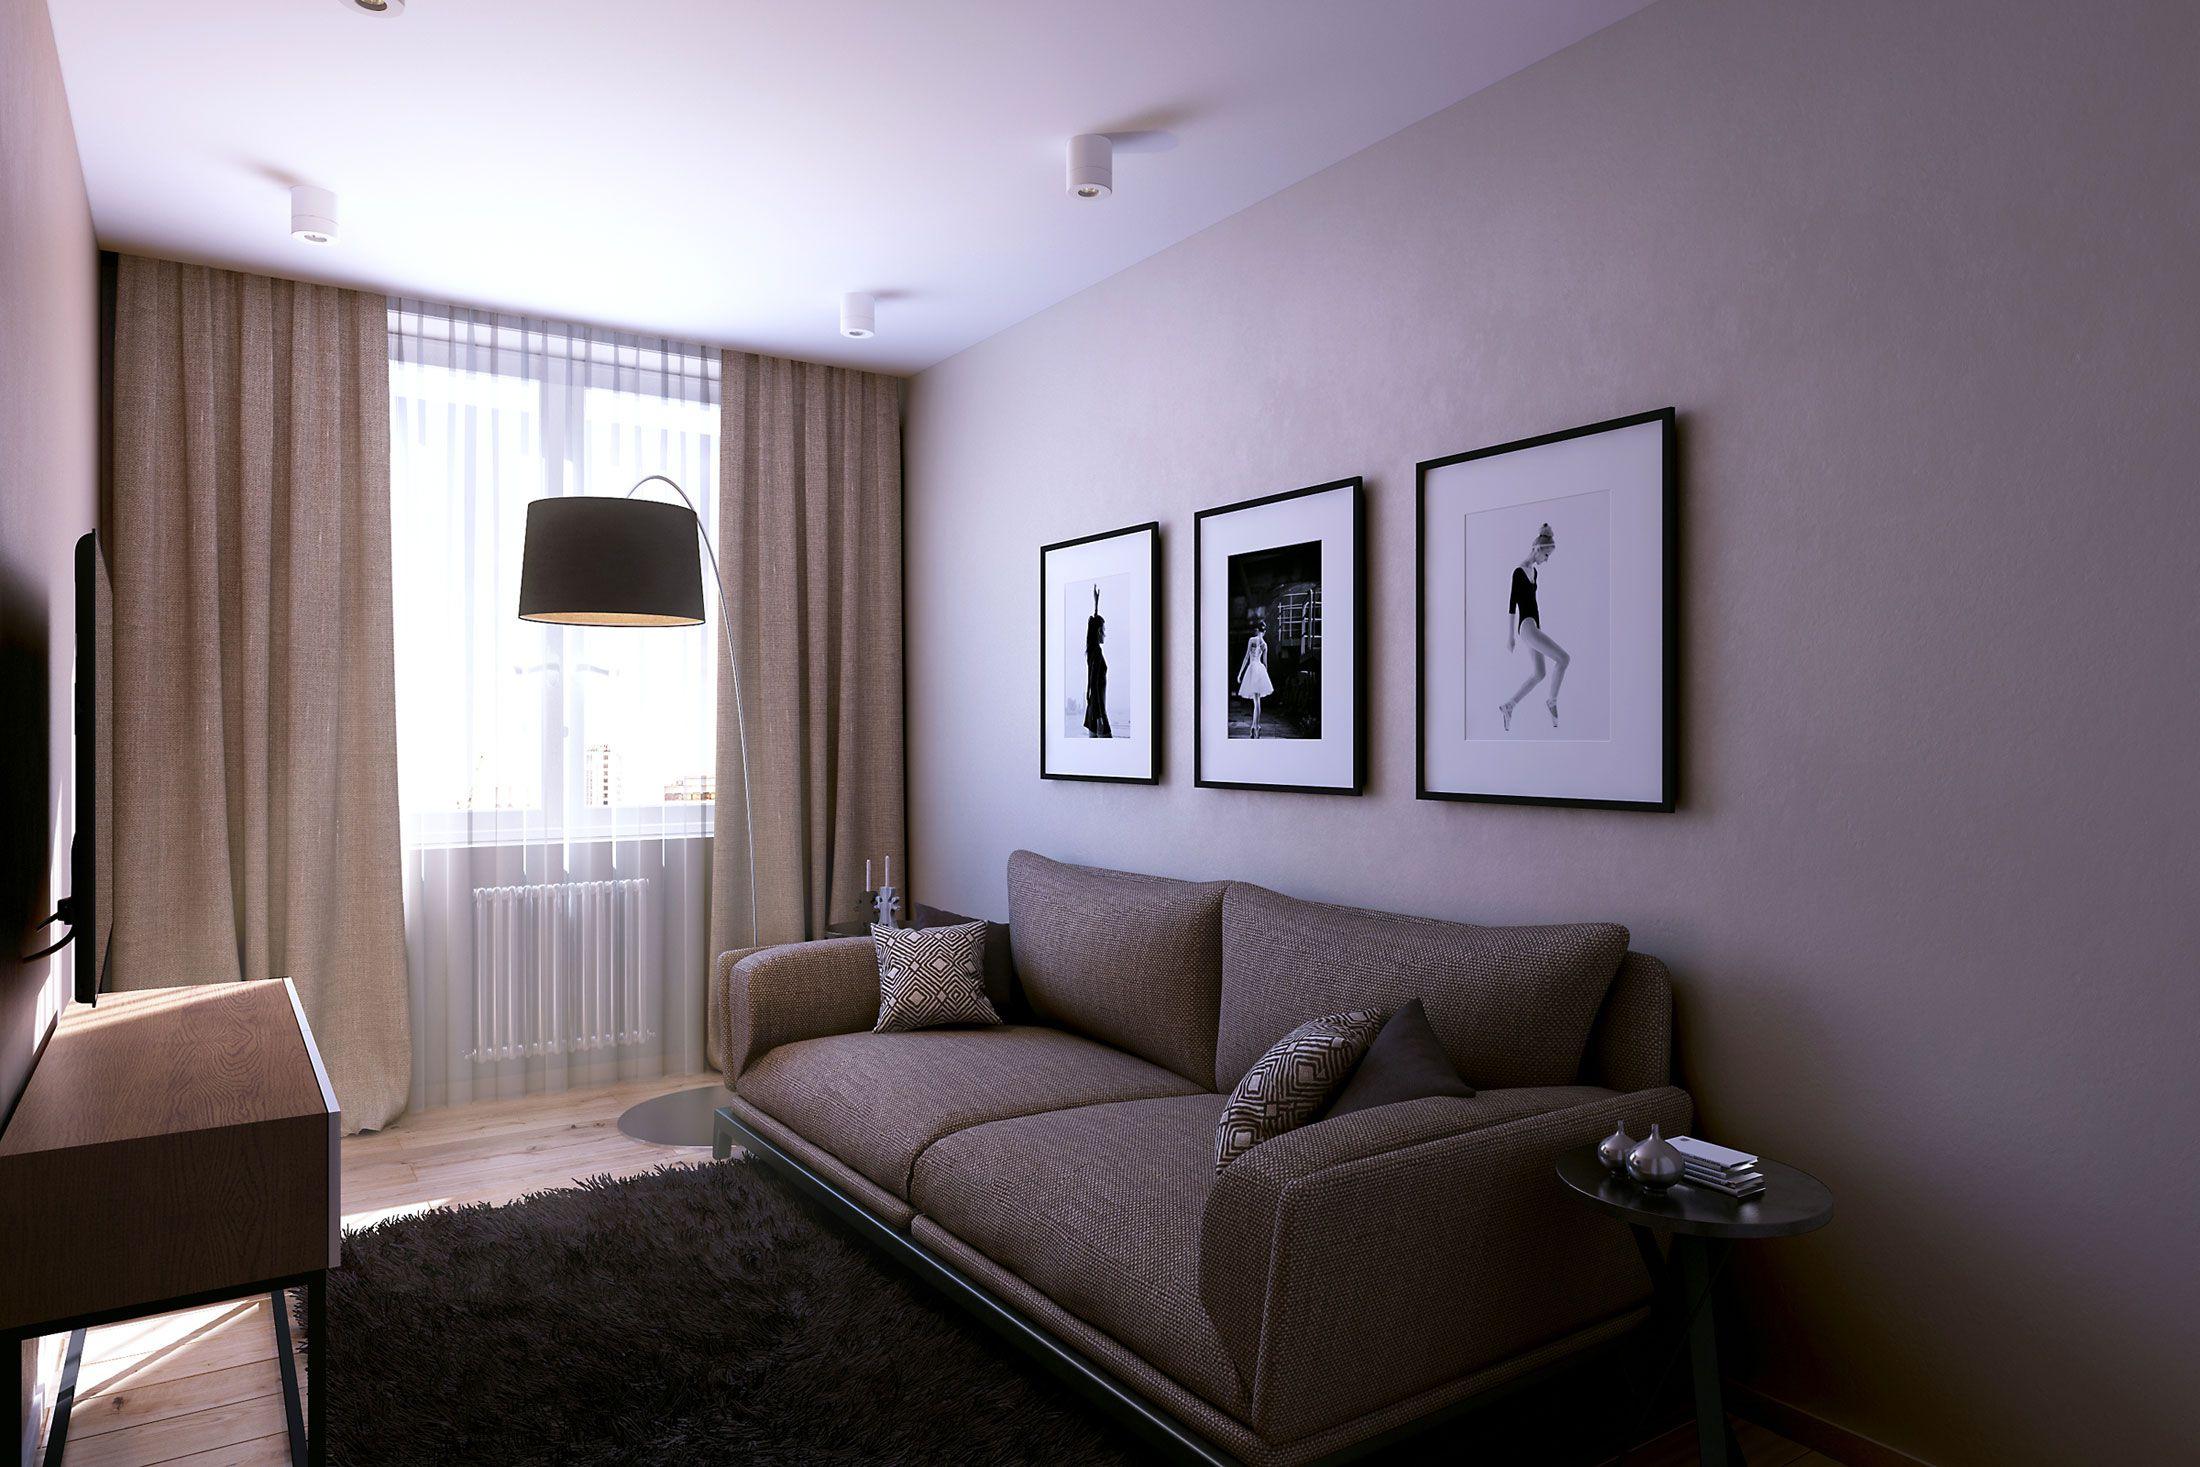 Bogatyrskiy-Modern-Apartment-05